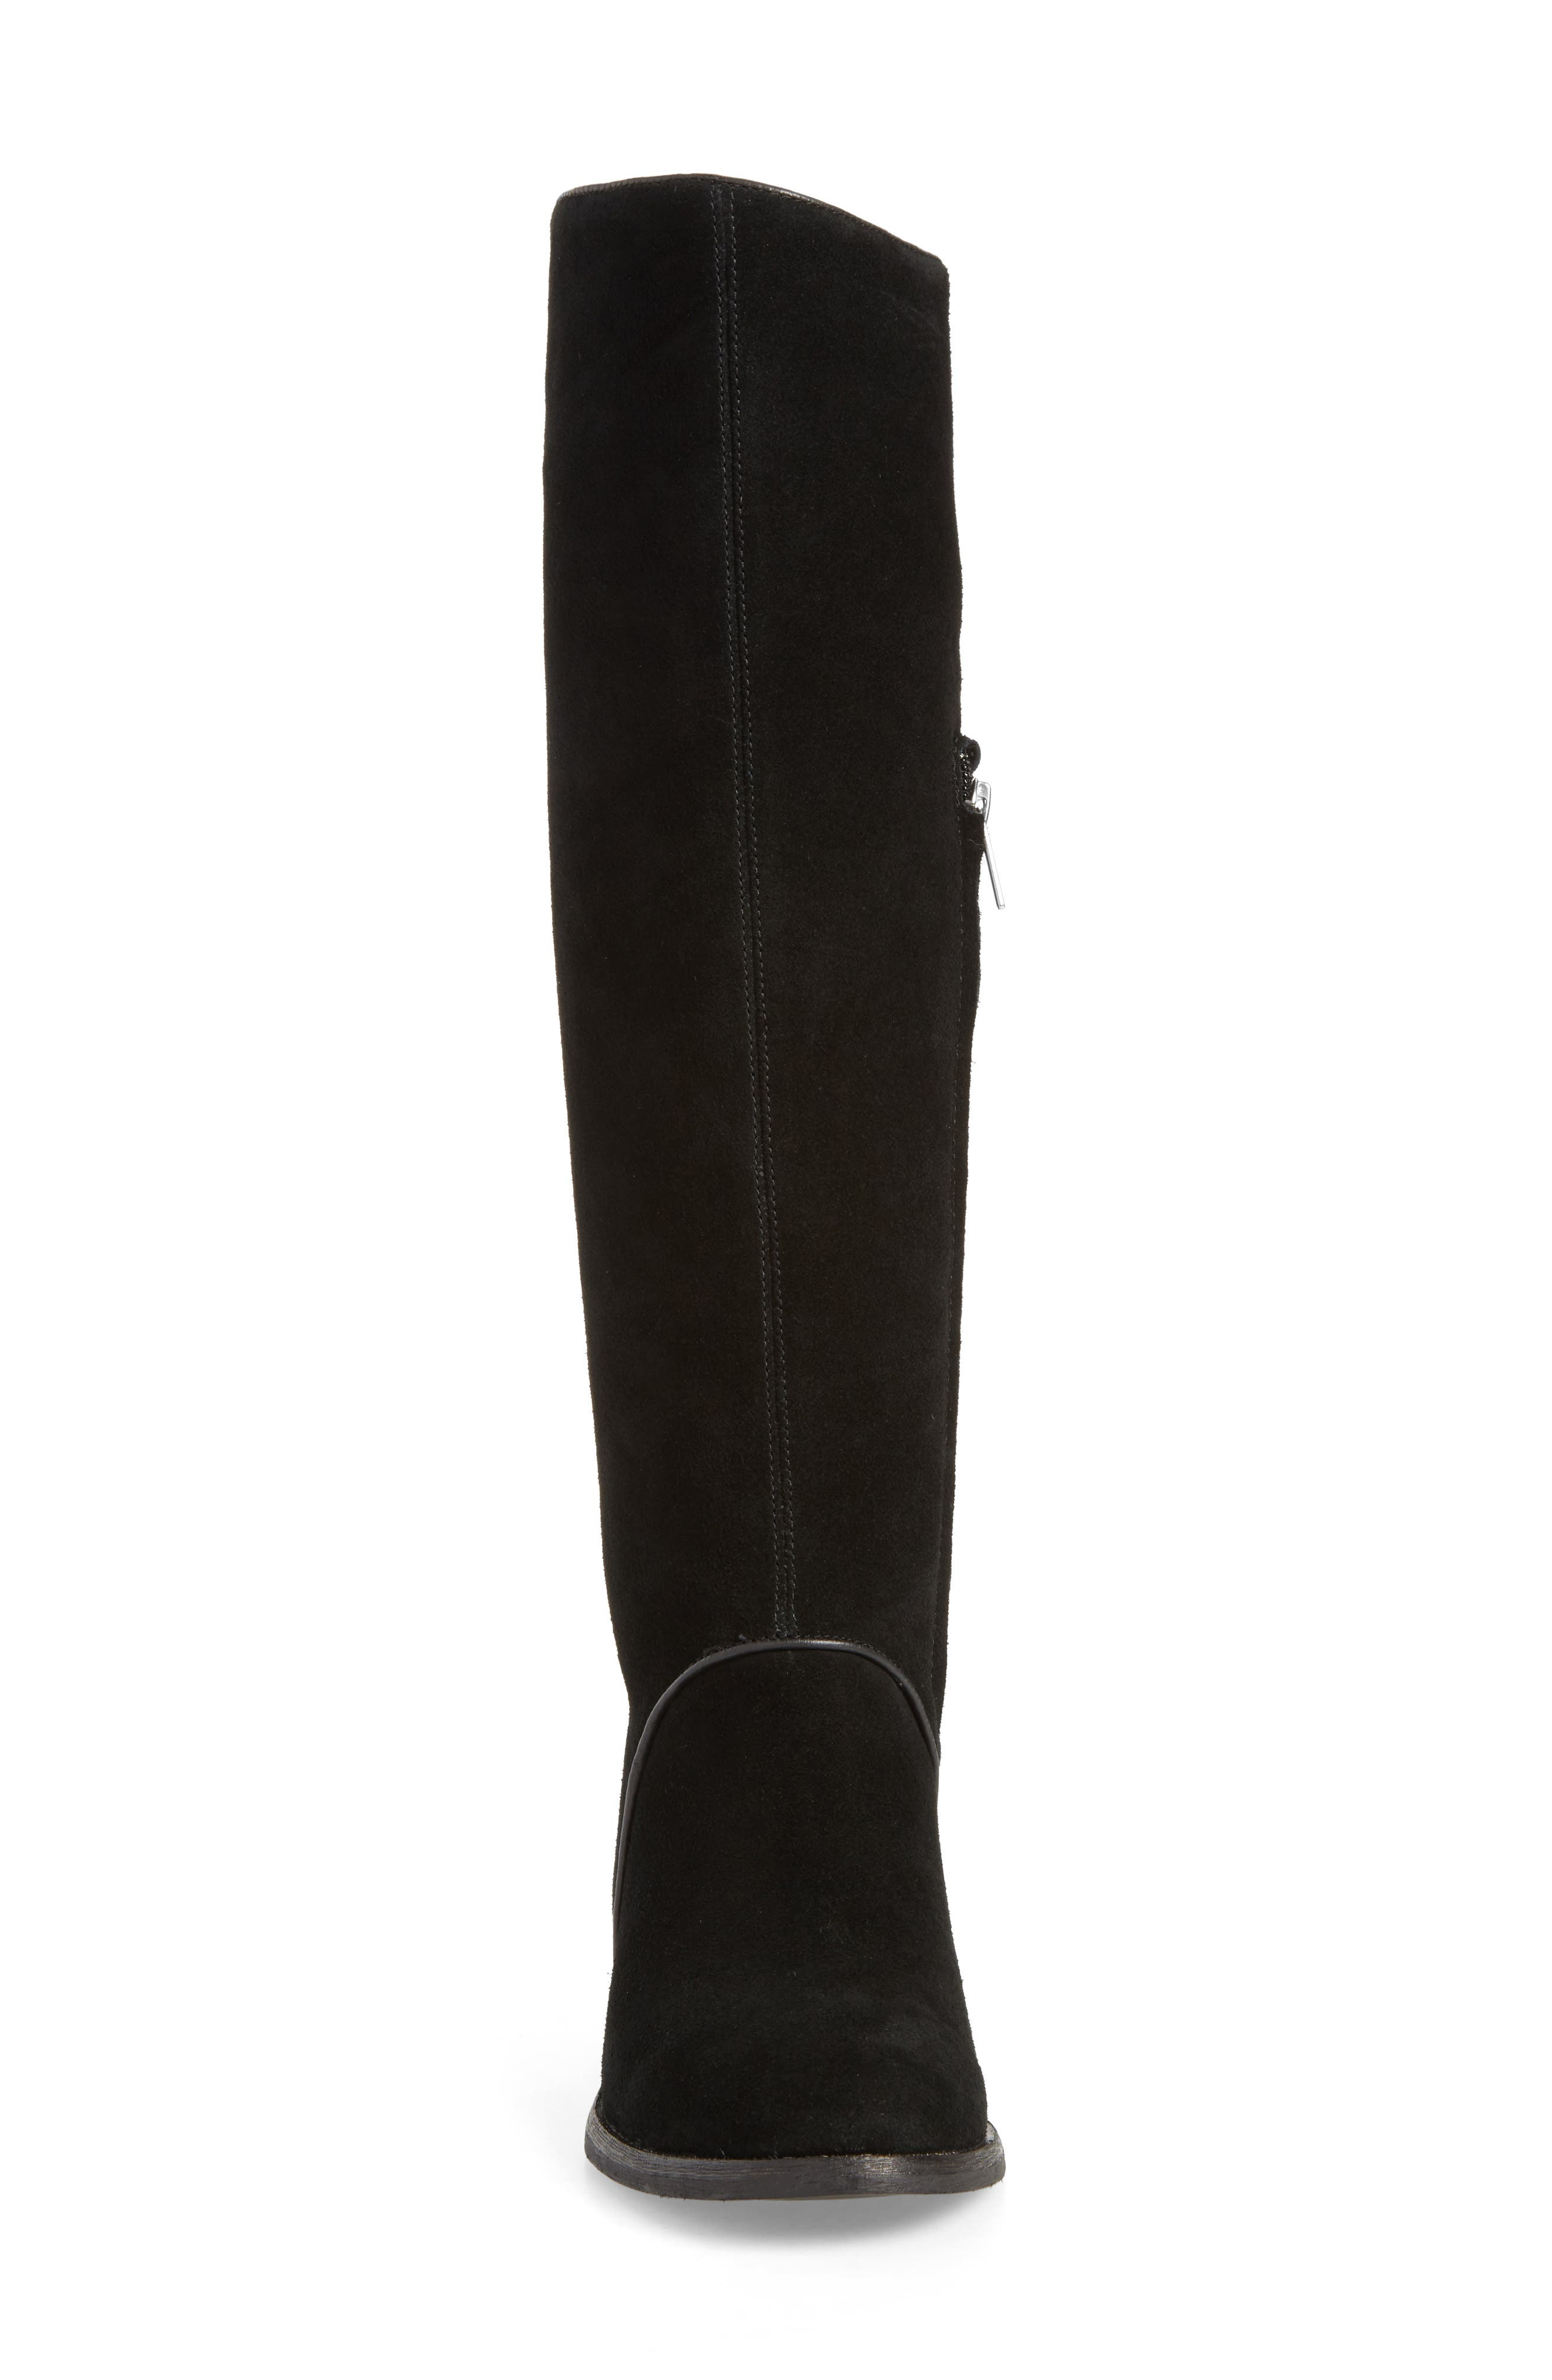 Gracen Knee High Boot,                             Alternate thumbnail 4, color,                             Black Suede